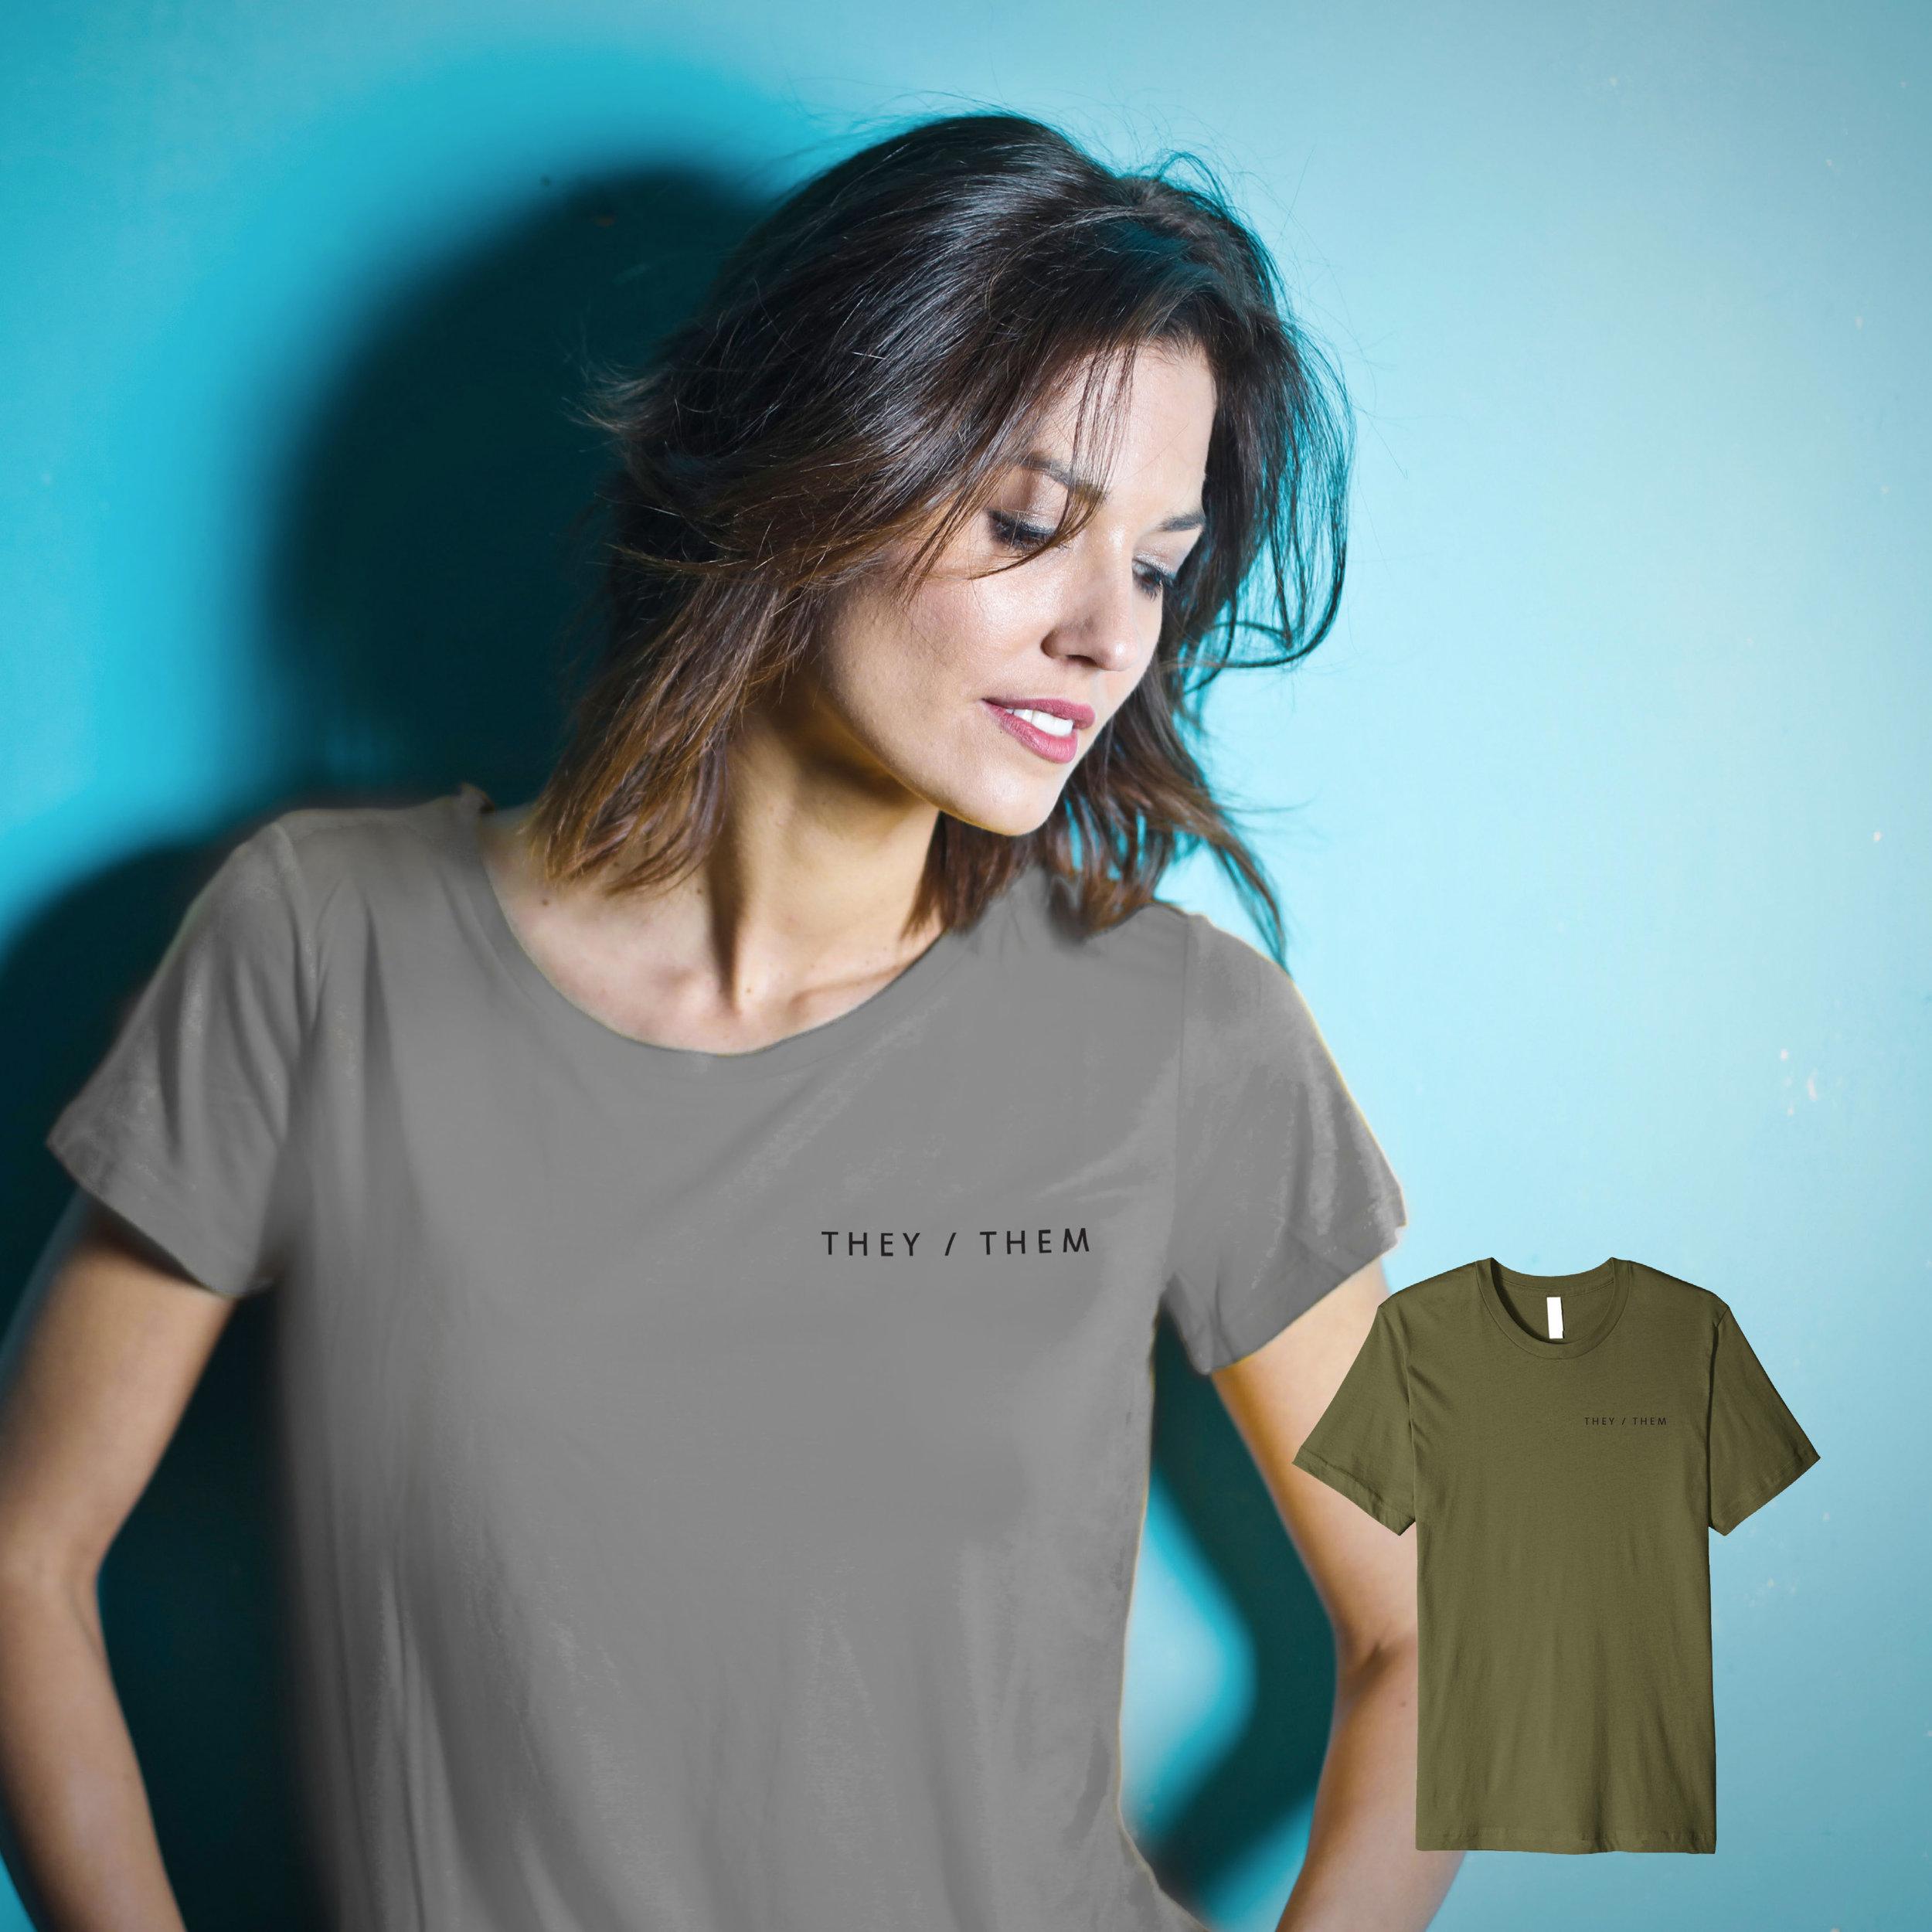 Tshirt_Group_#1-3.jpg